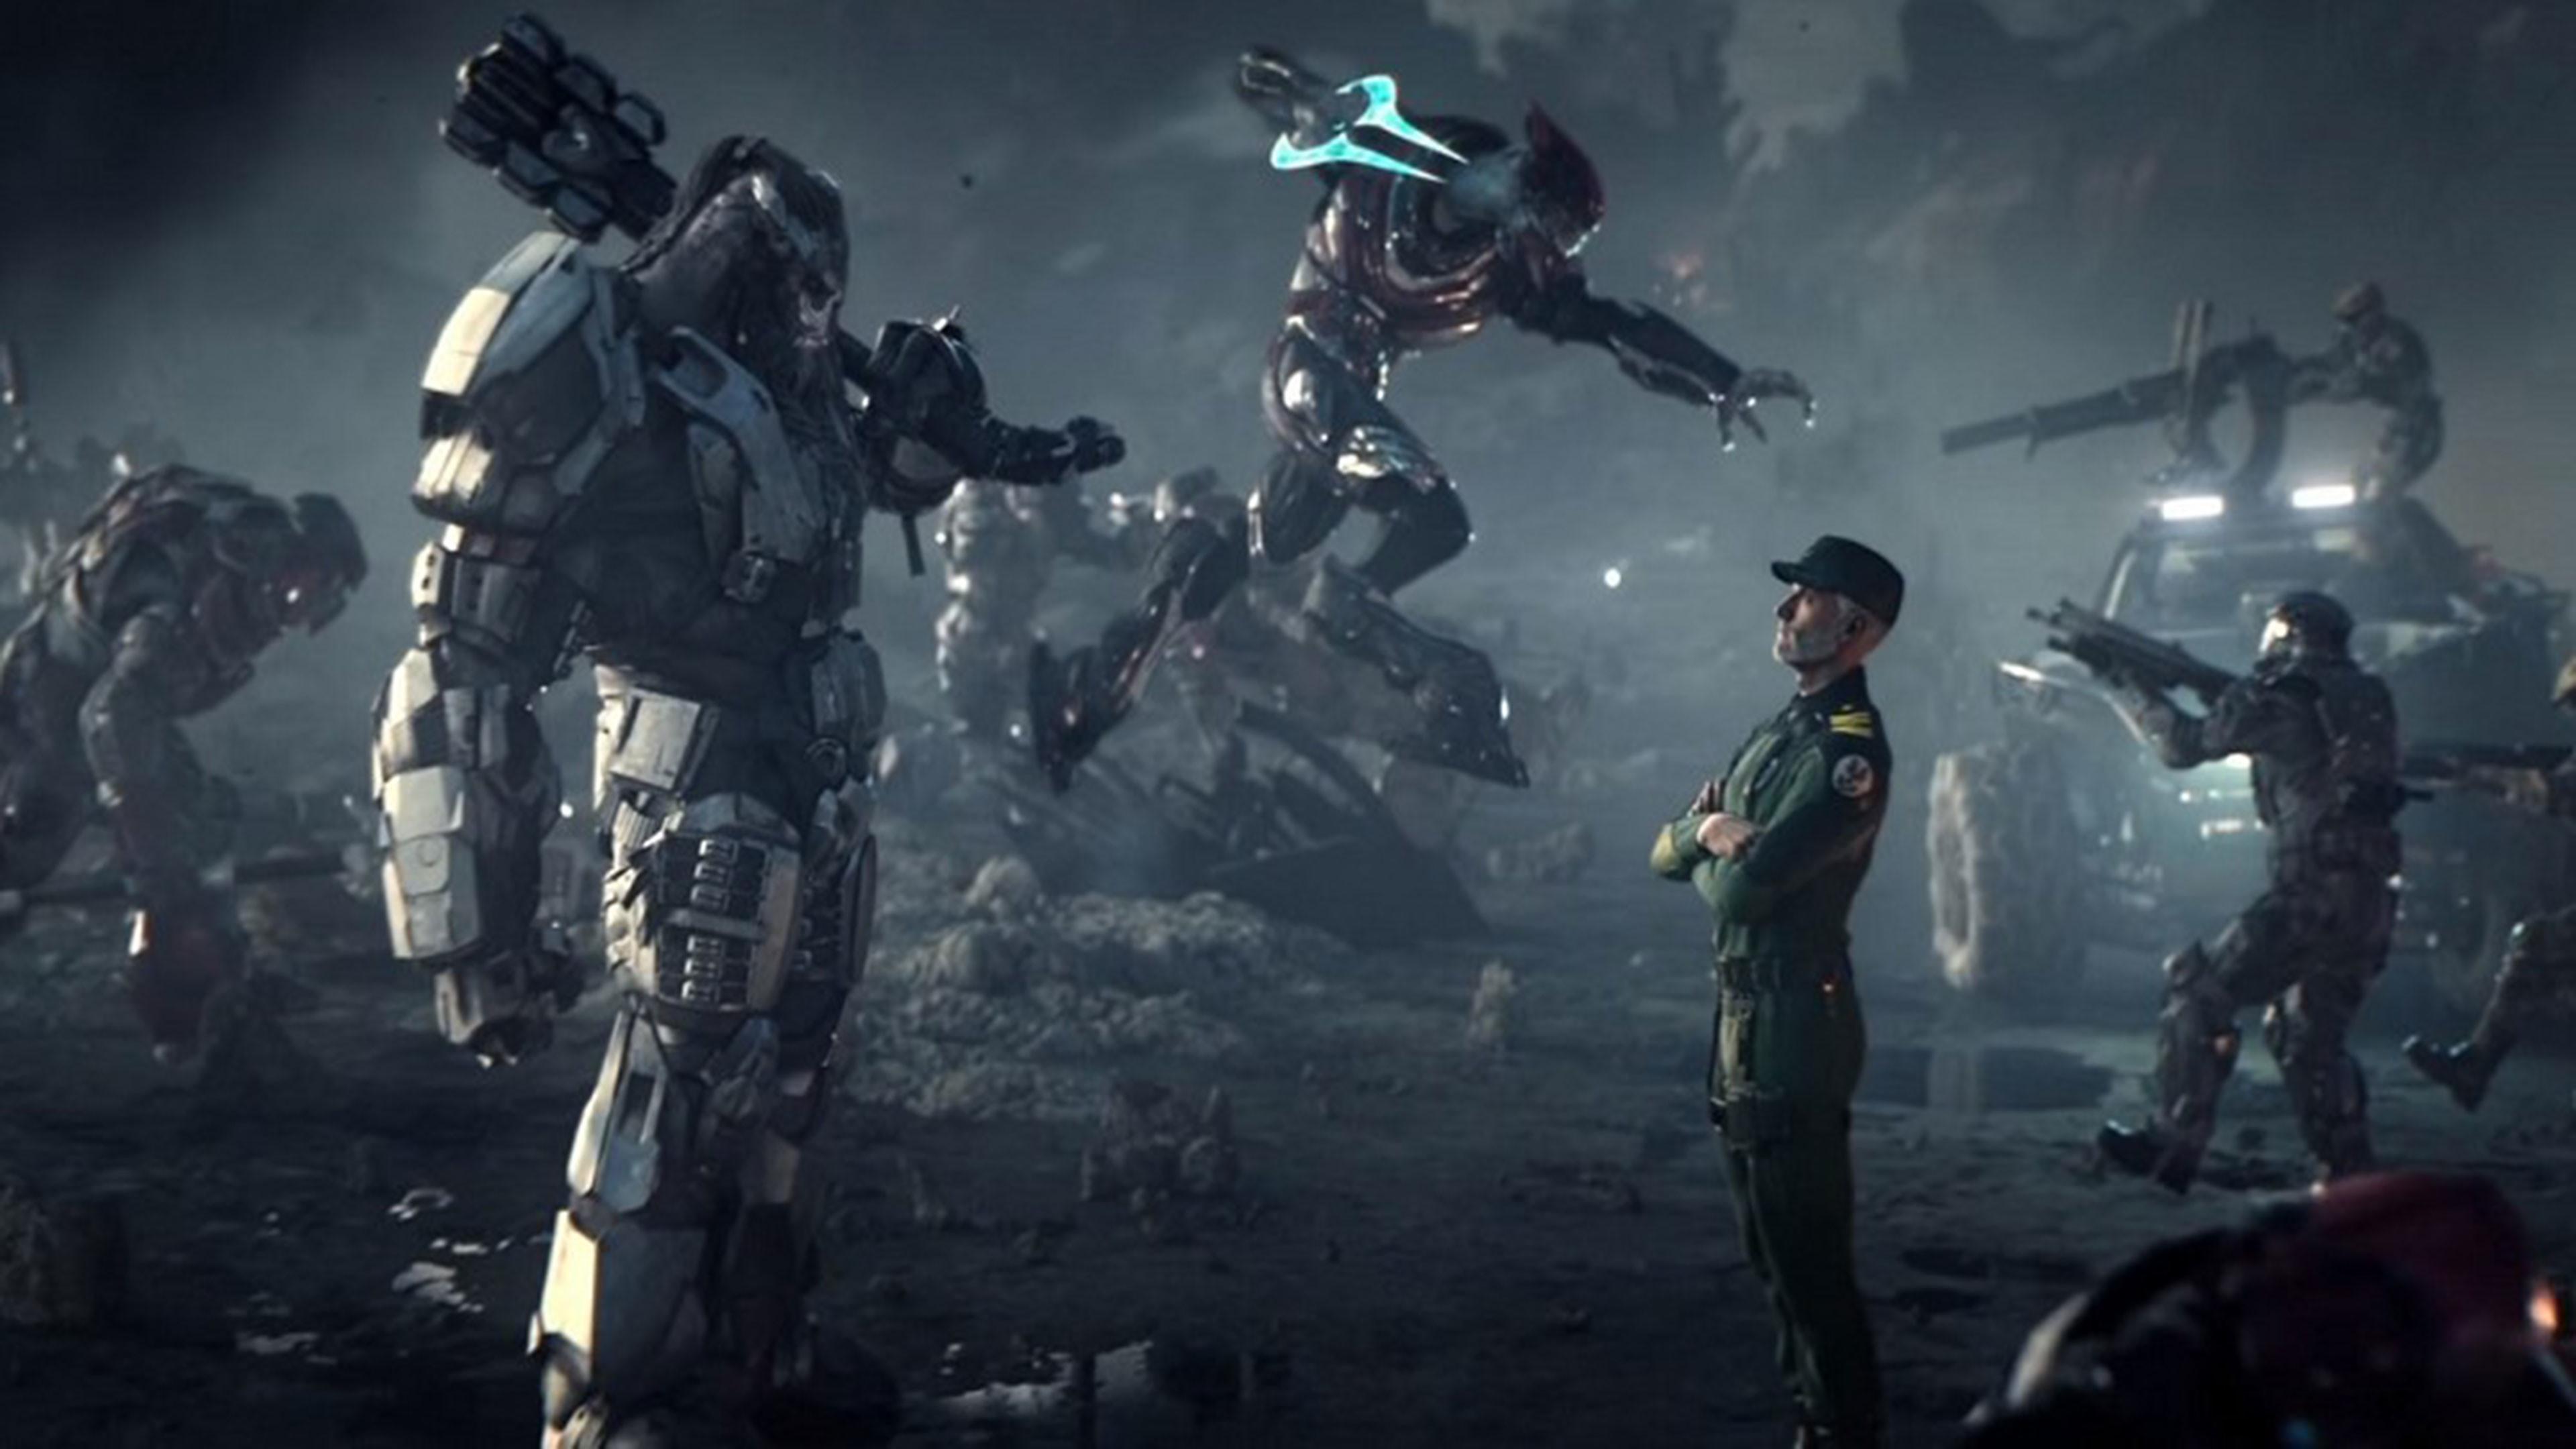 Res: 3840x2160, Halo Wars 2 4K Wallpaper ...